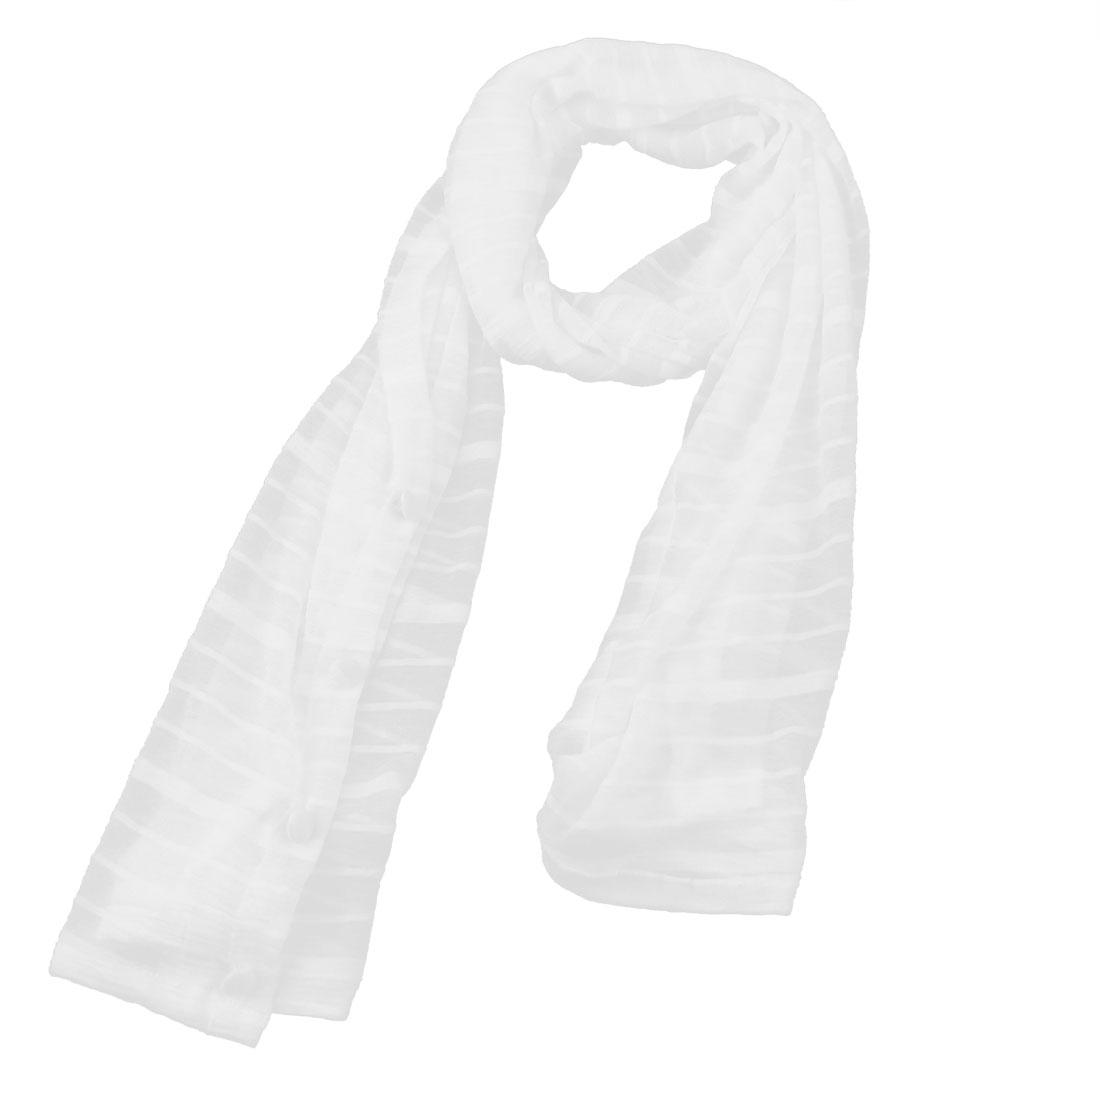 "56.7"" x 18.3"" Button Down Design White Rectangle Wrap Shawl"